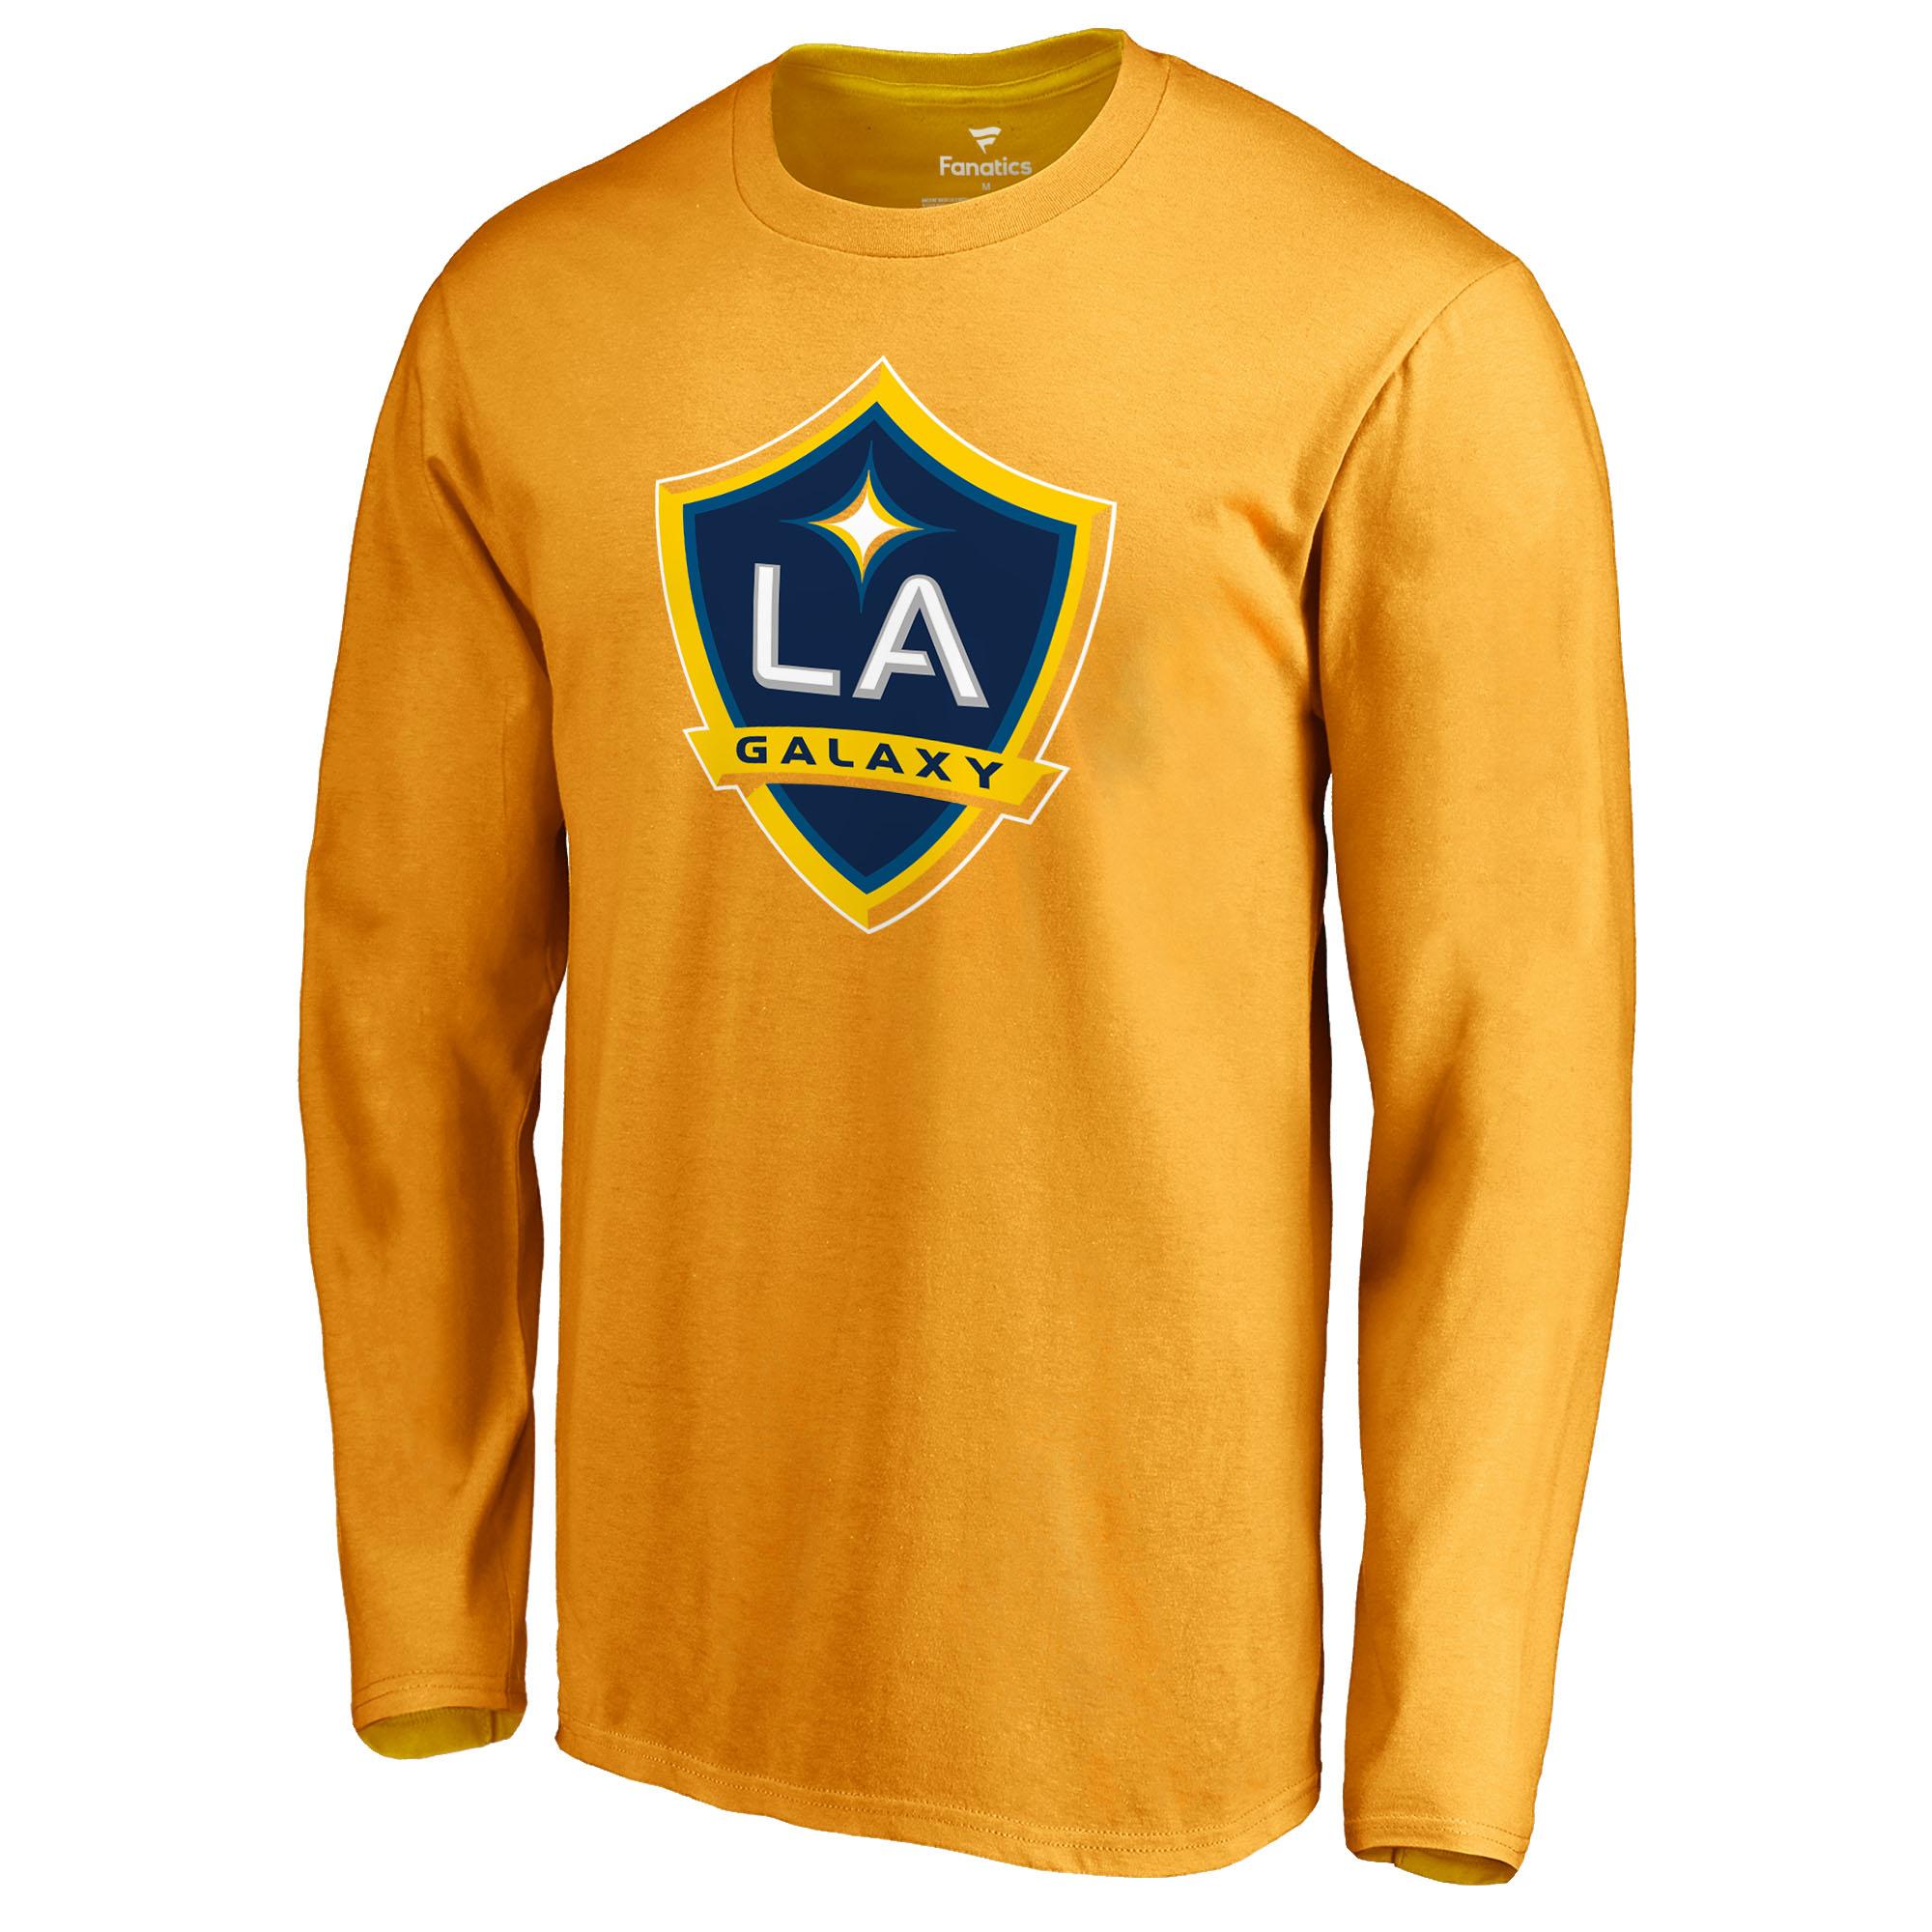 ba2c570add2 Zlatan Ibrahimovic LA Galaxy Fanatics Branded Backer Long Sleeve T-Shirt -  Gold